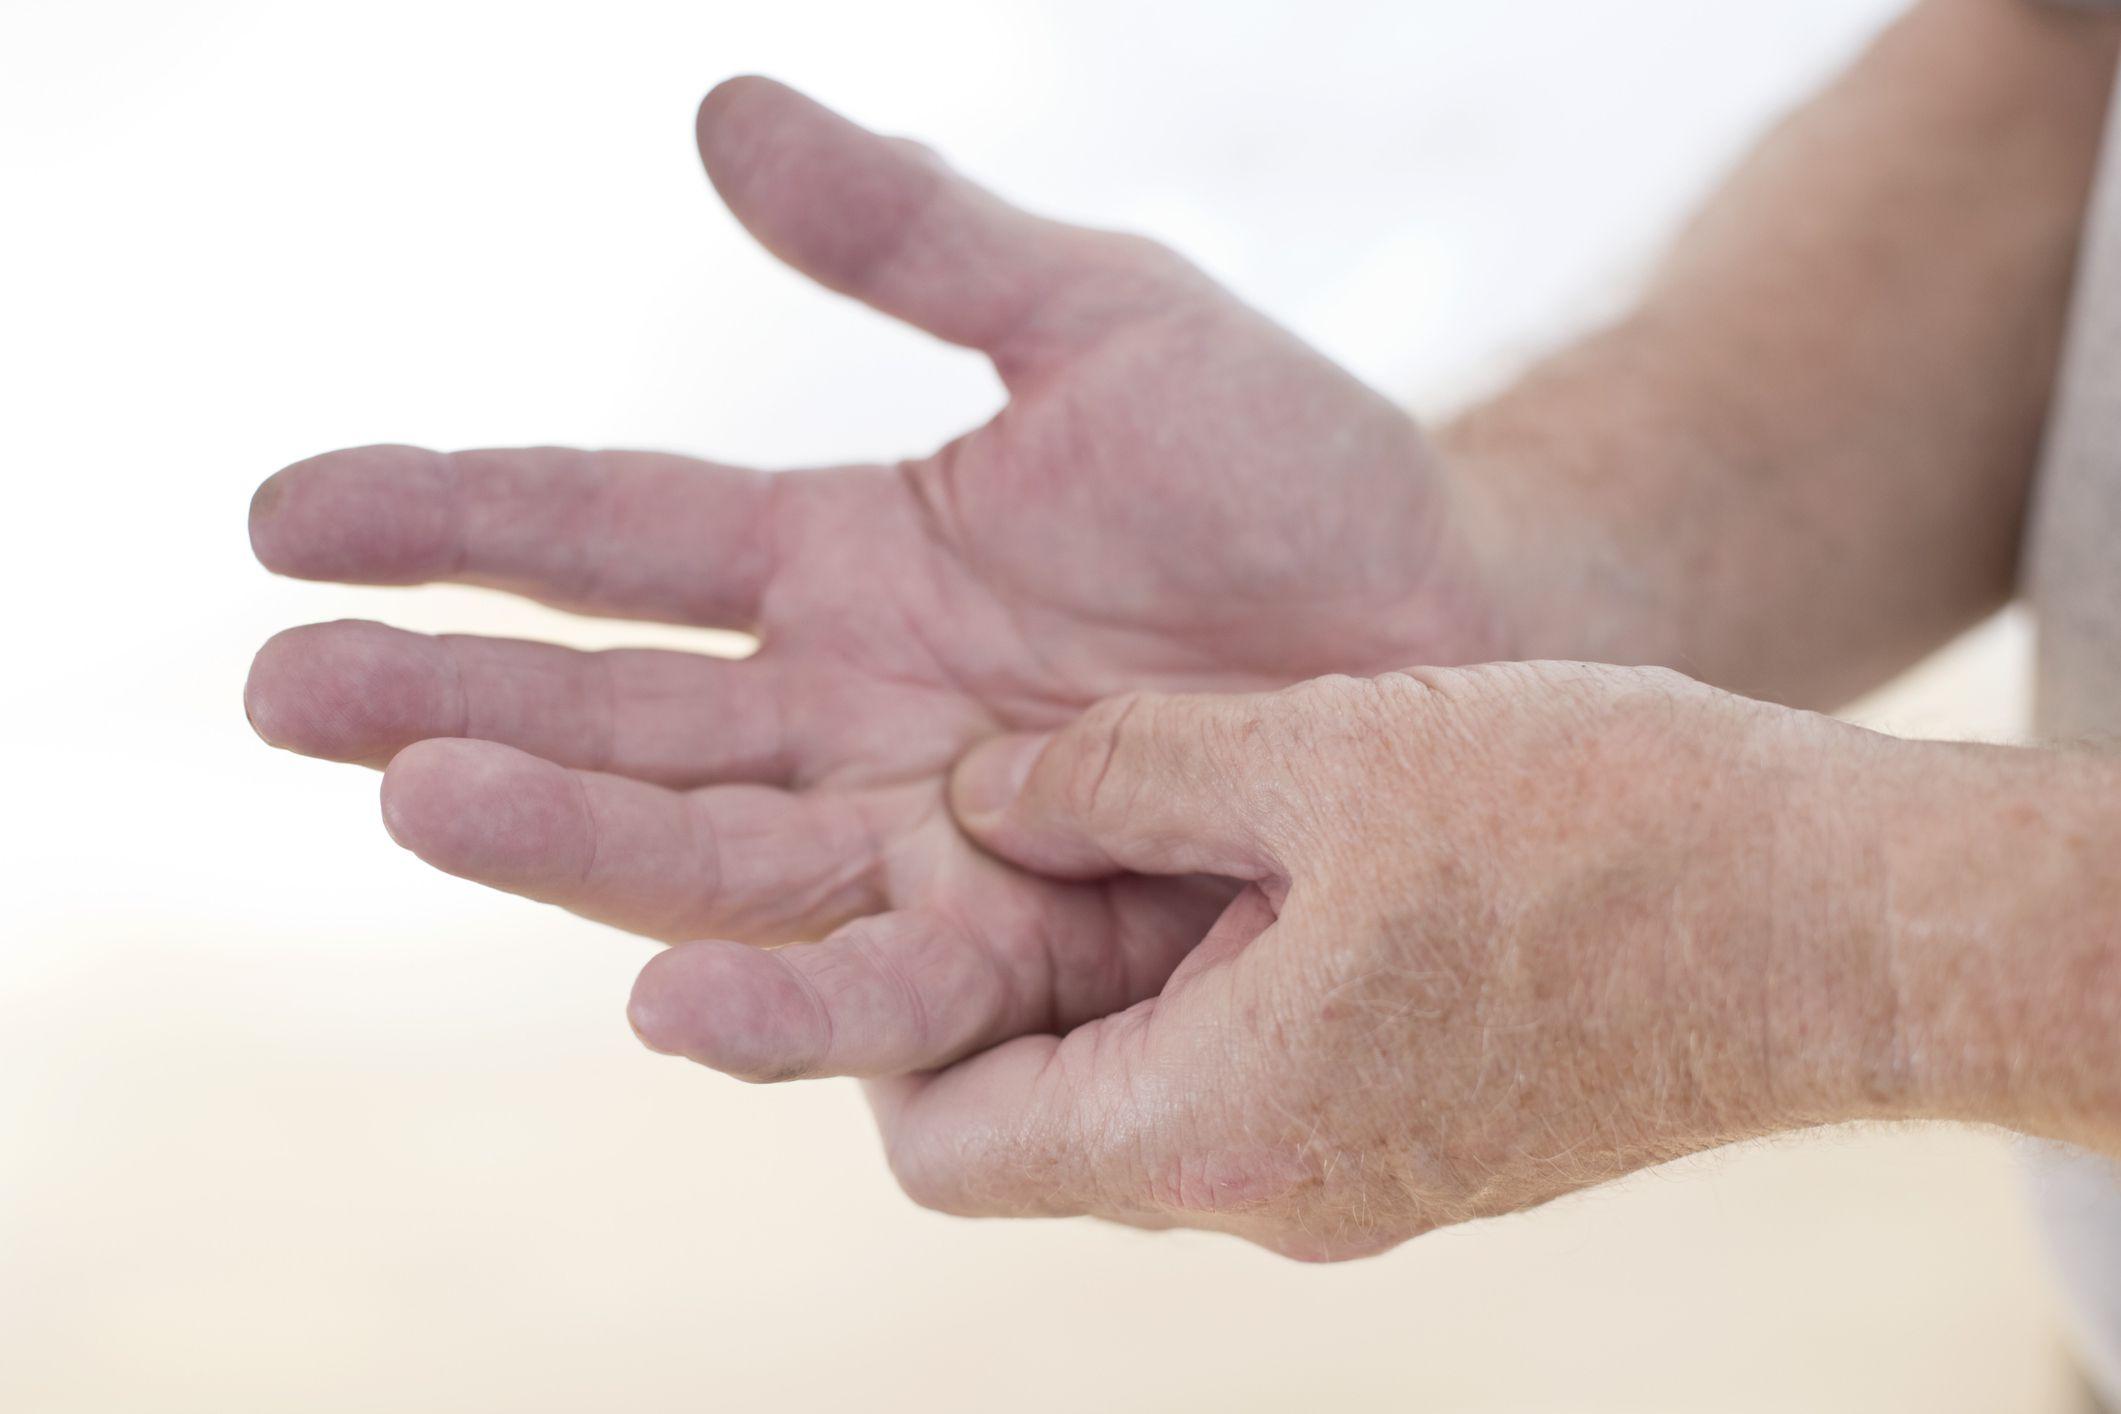 Man rubbing sore hand